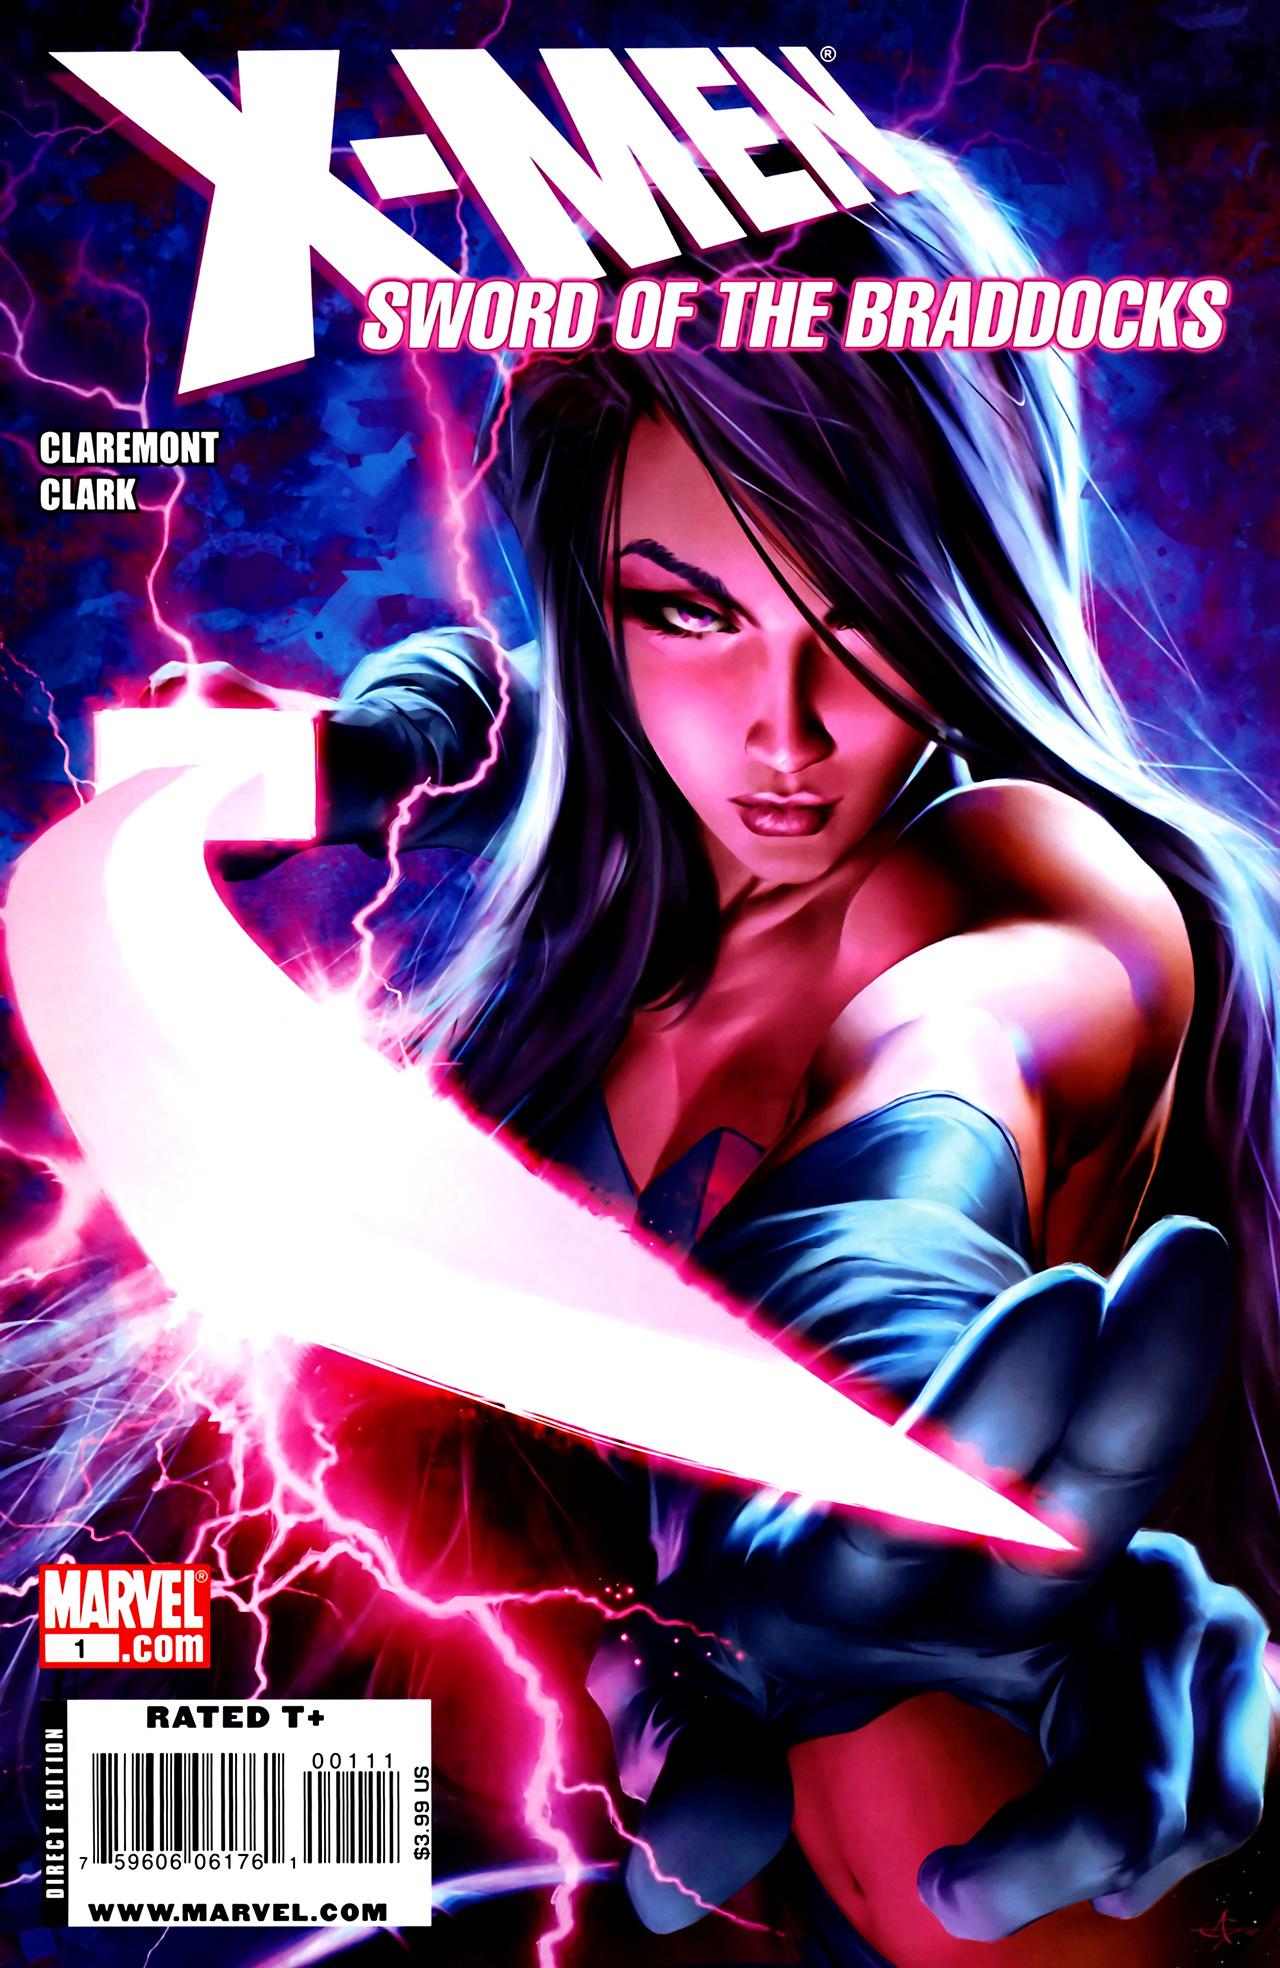 X-Men: Sword of the Braddocks Full Page 1